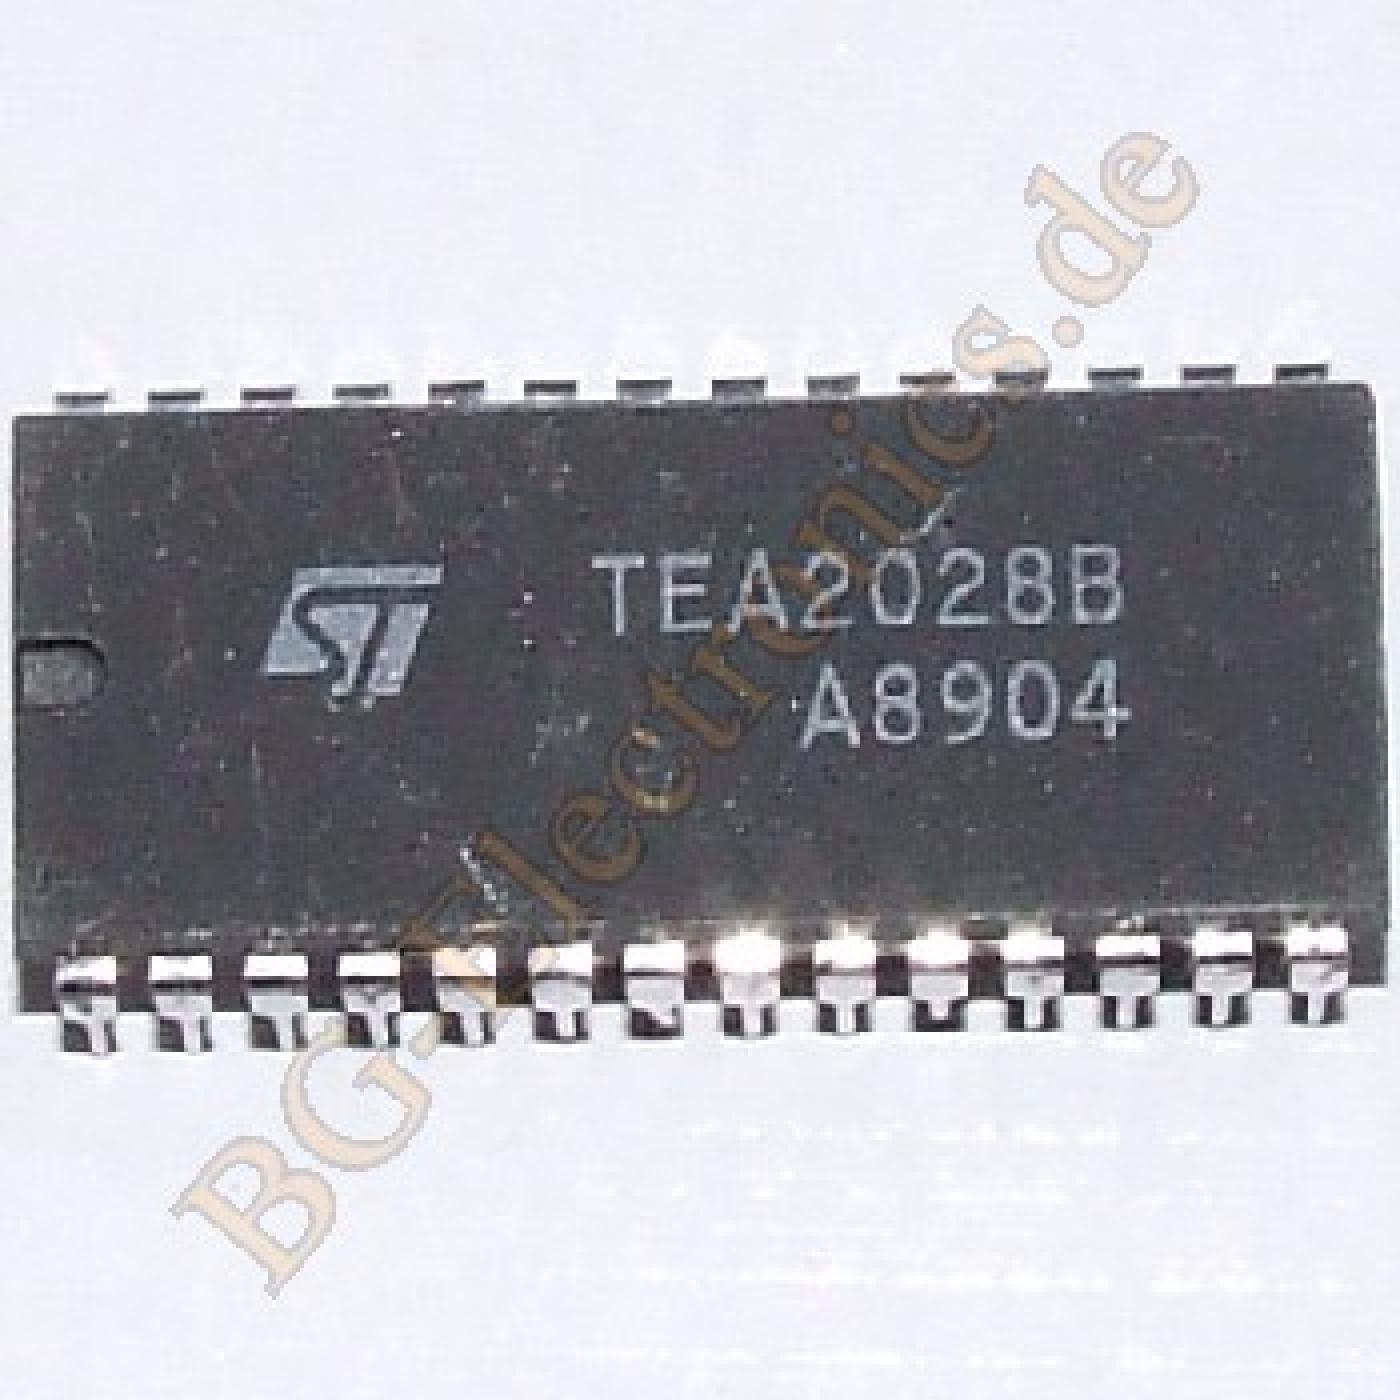 TEA2028B, BG-ELECTRONICS TEA2028B, TEA2028